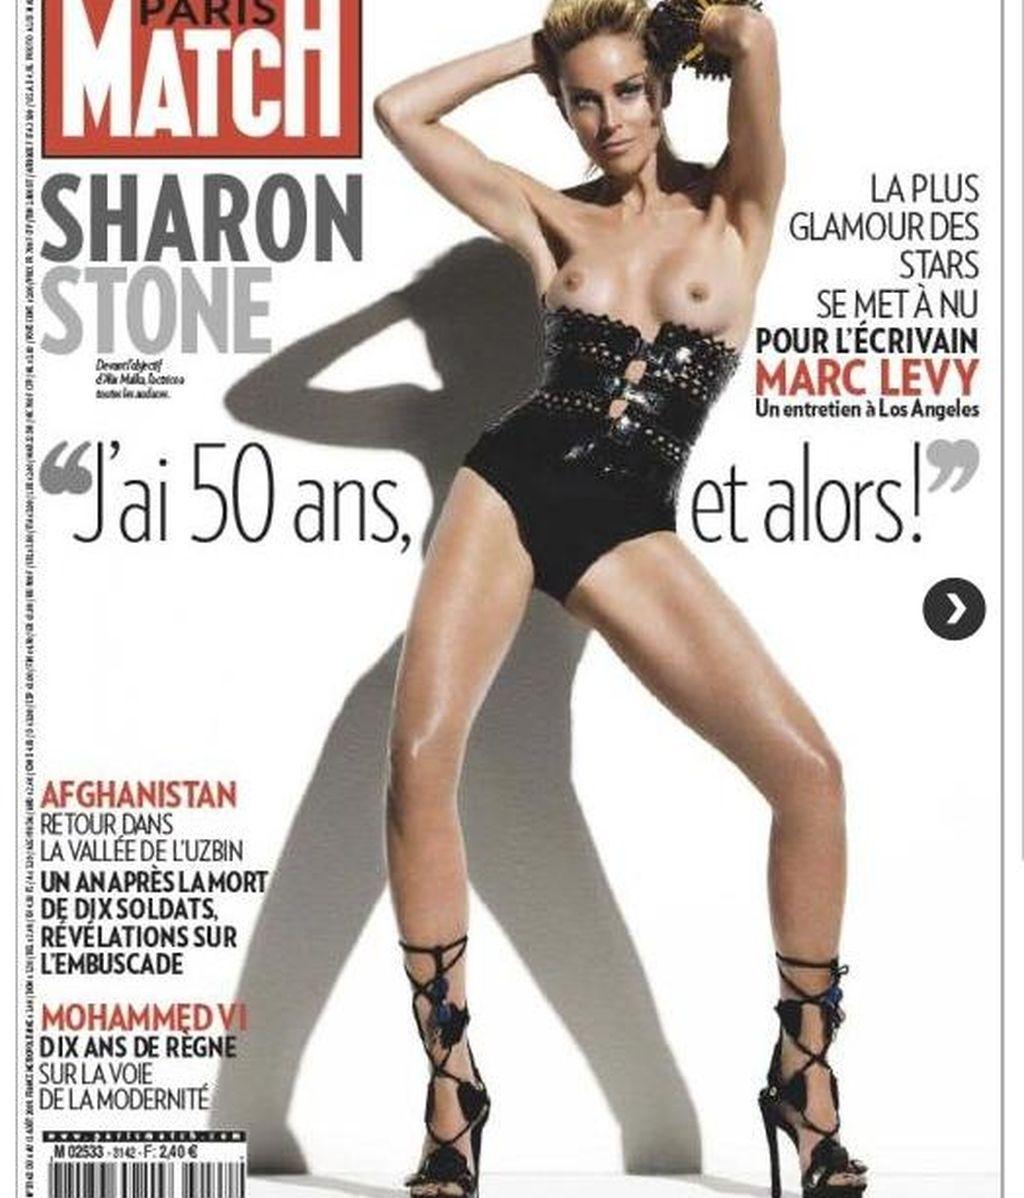 Sharon Stone, instinto a los 50